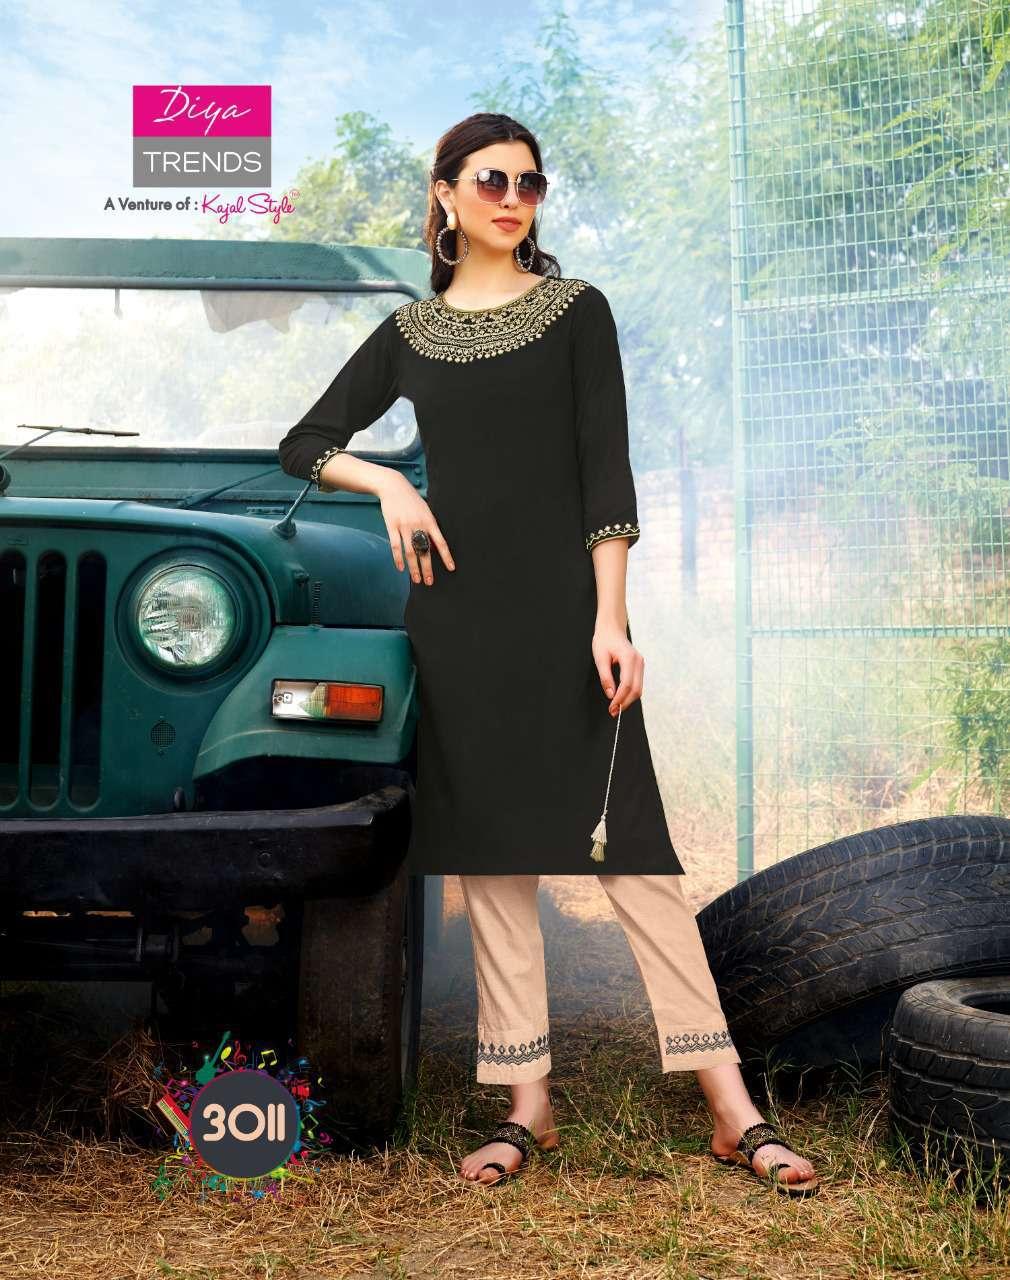 Diya Trends Forever Vol 3 by Kajal Style Kurti with Pant Wholesale Catalog 12 Pcs 11 - Diya Trends Forever Vol 3 by Kajal Style Kurti with Pant Wholesale Catalog 12 Pcs